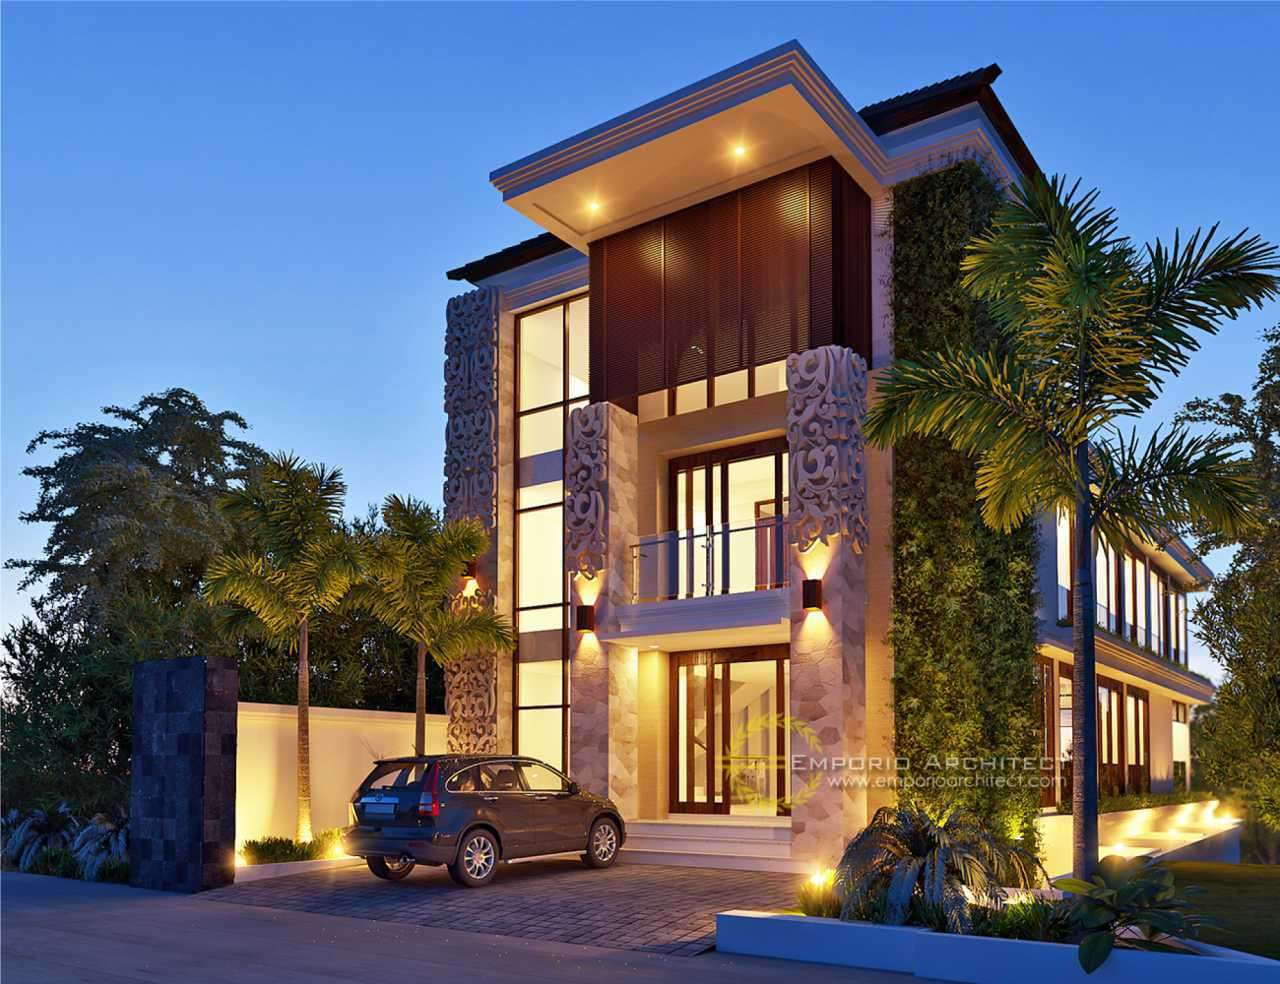 3 Desain Guest House Terbaik Karya Emporio Architect